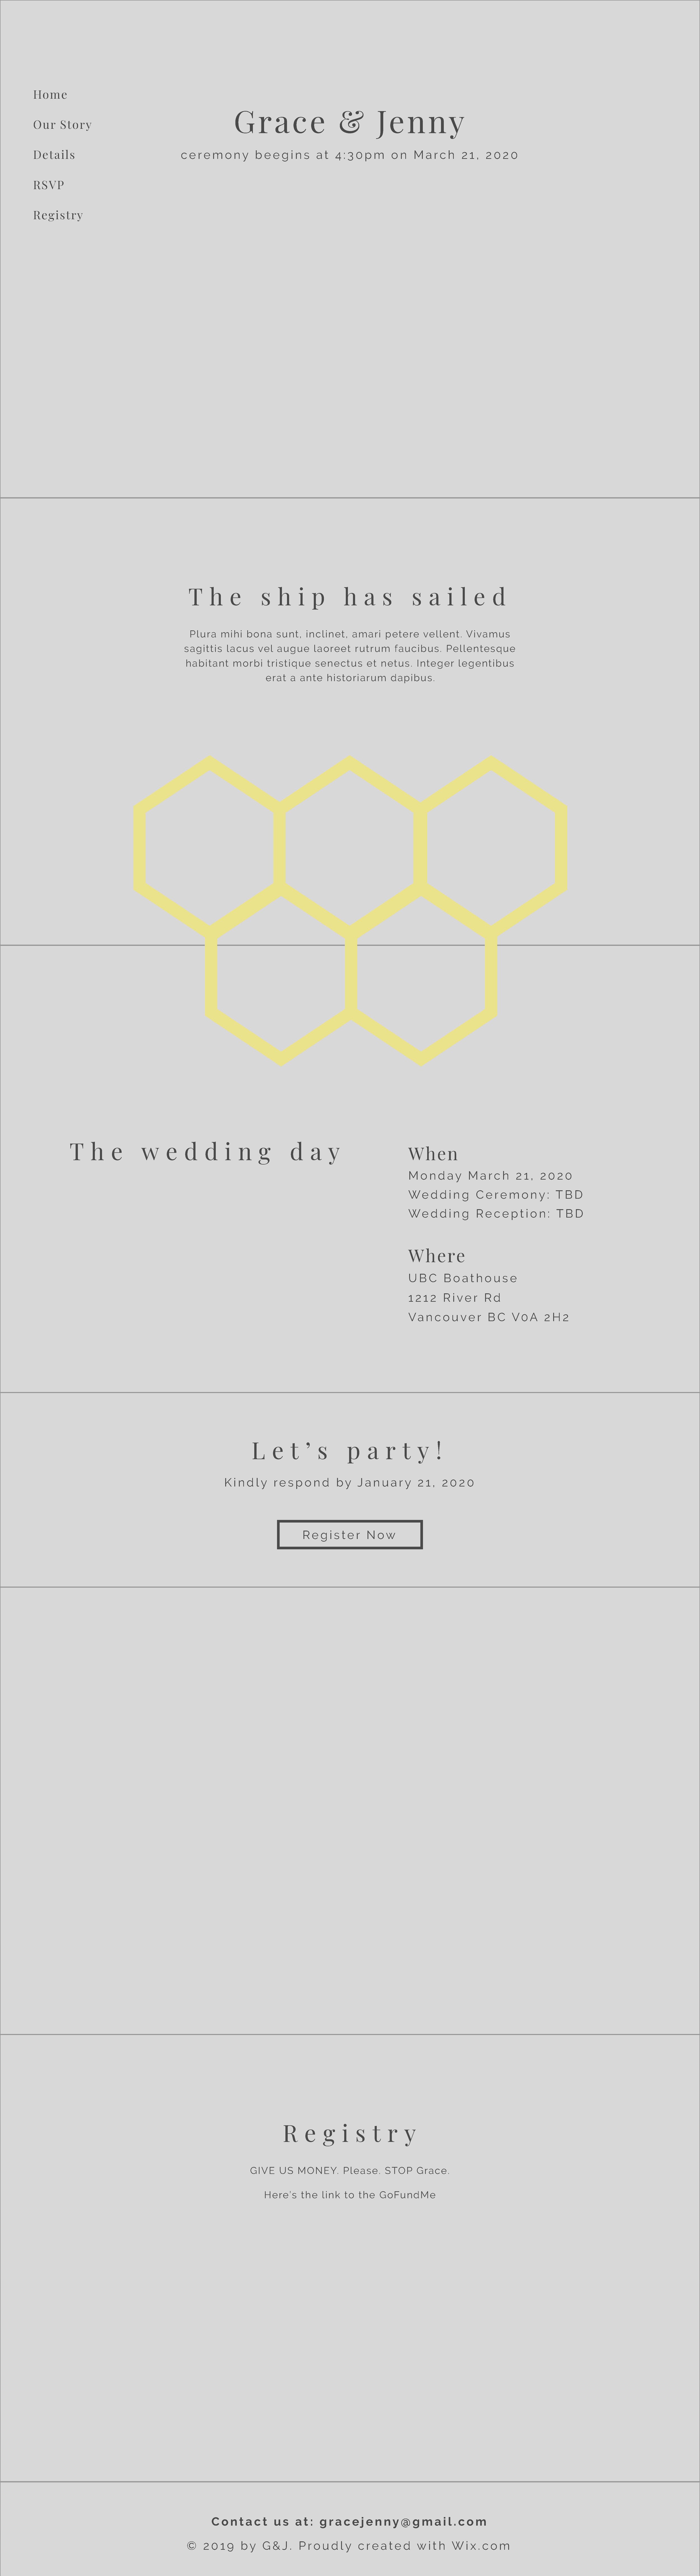 Graphic Design Wedding Invitation Print And Web Sj Diana L